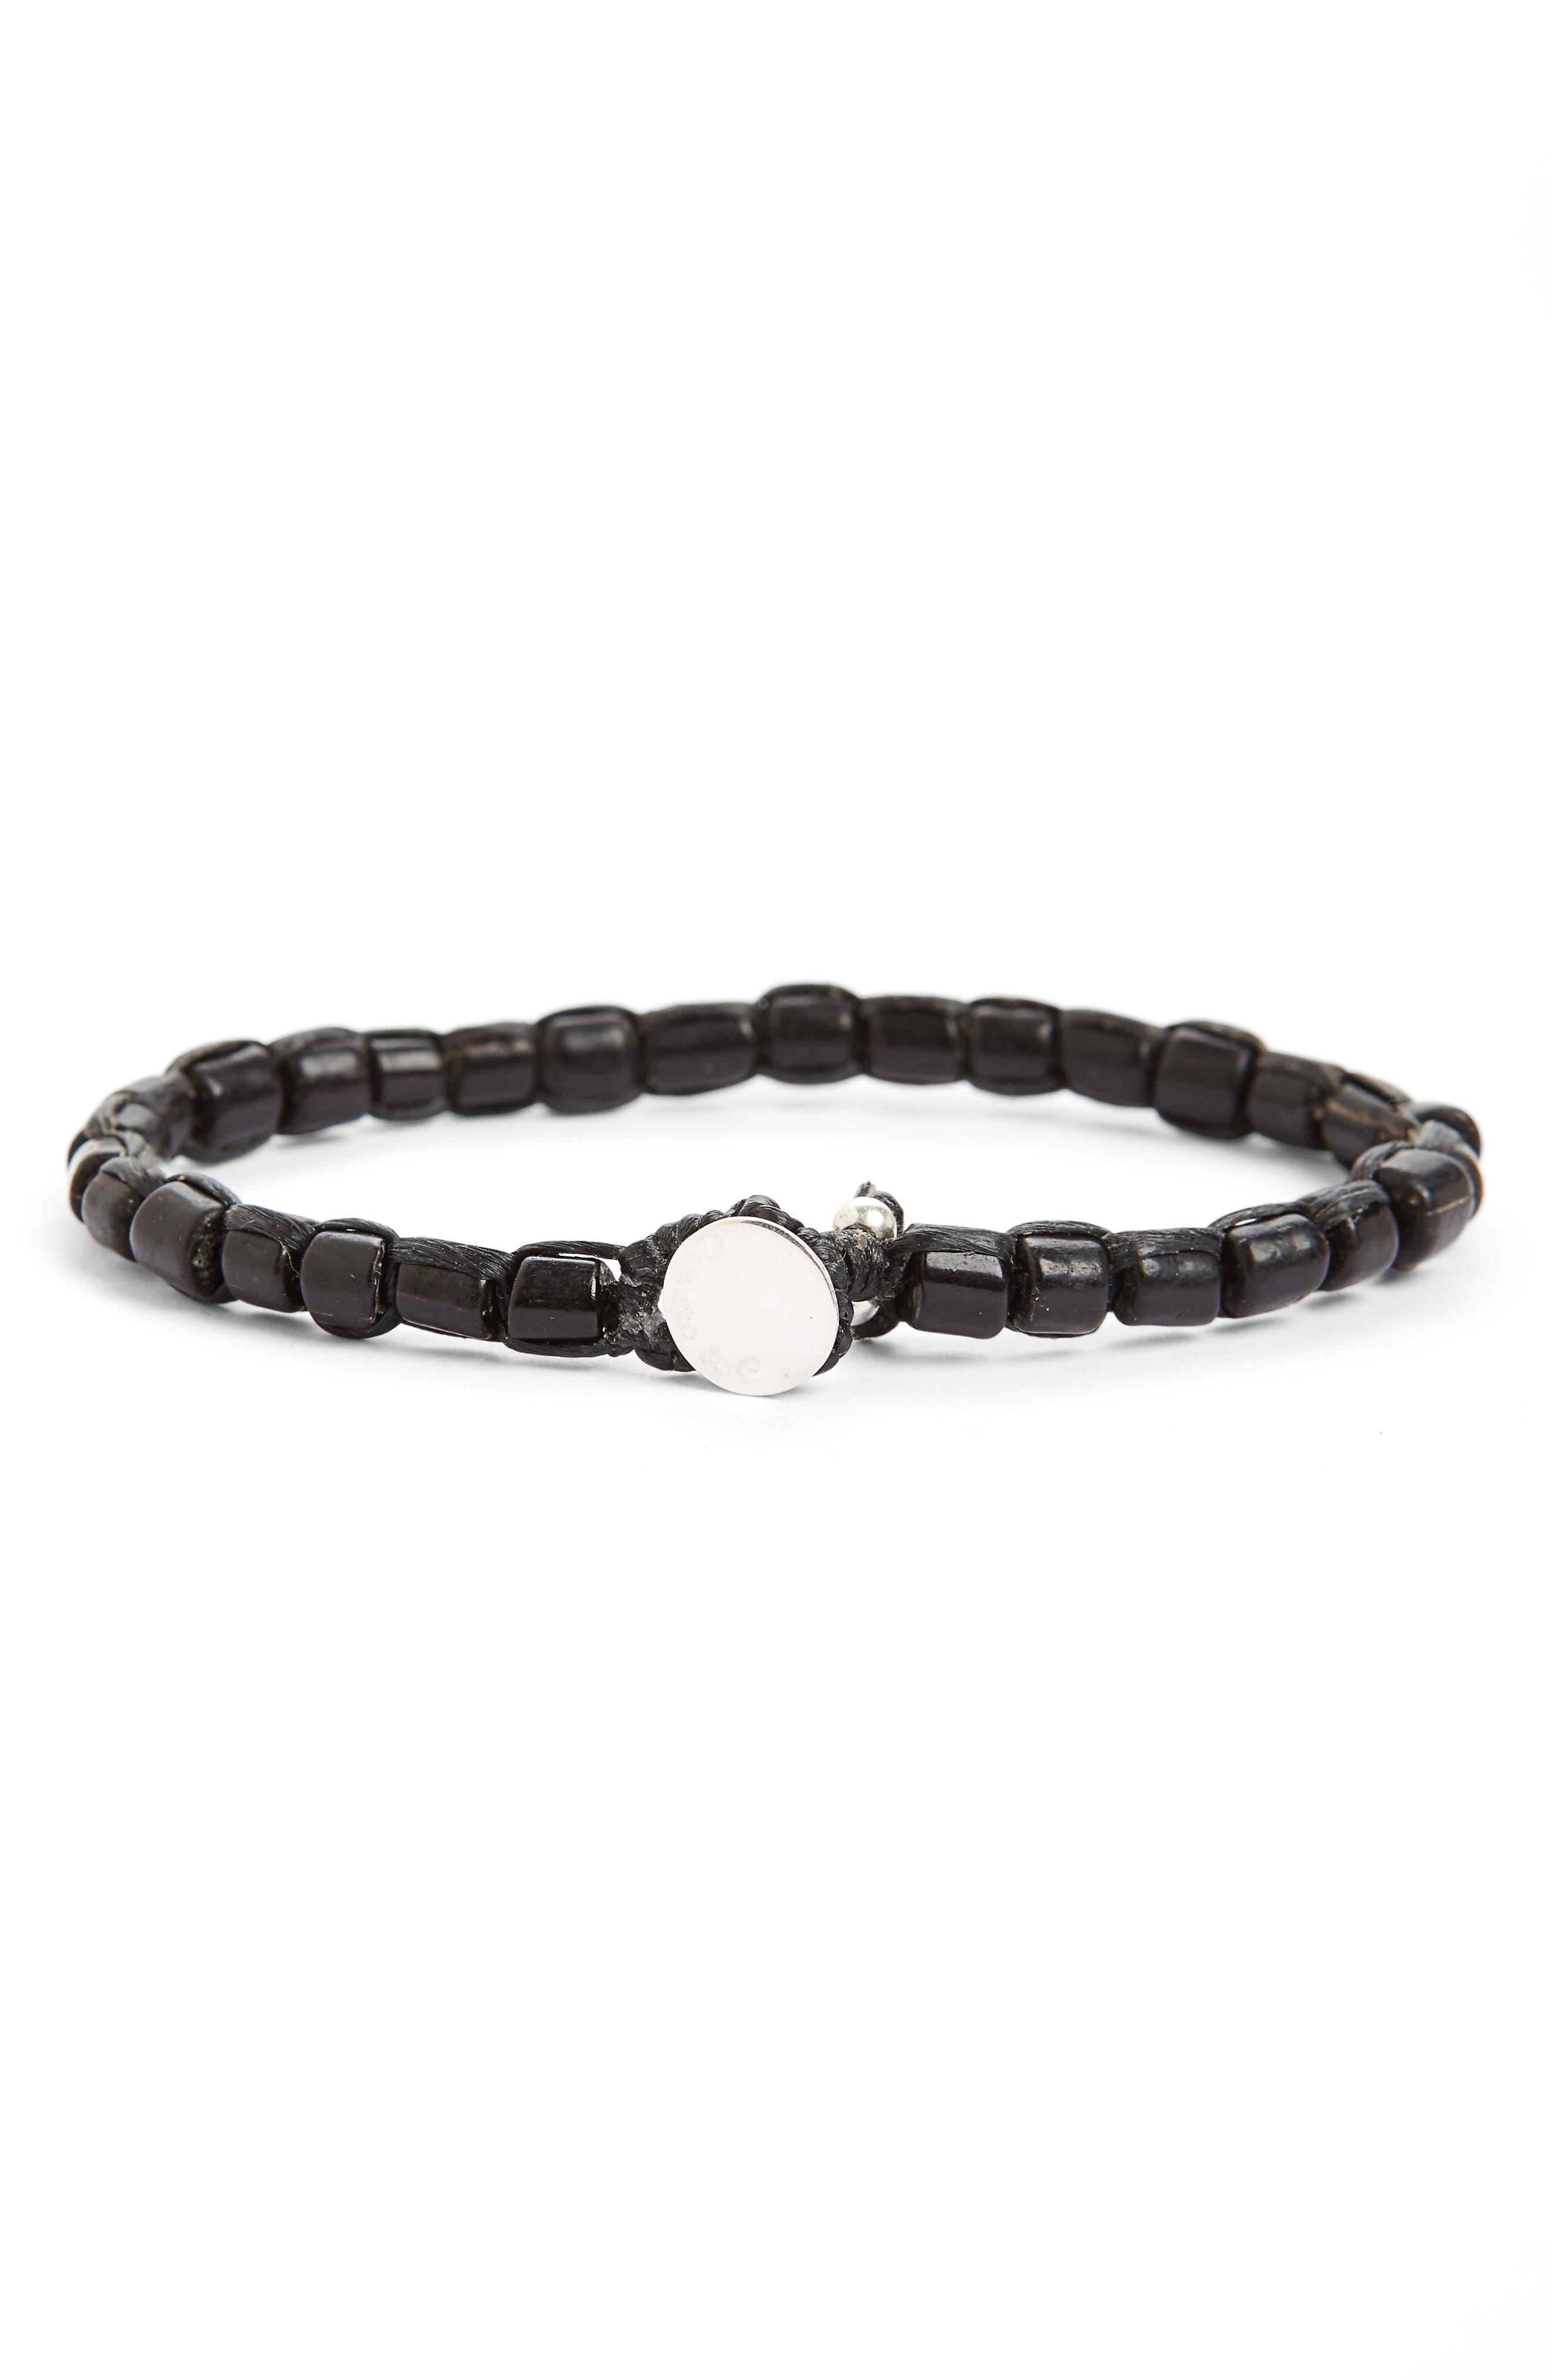 Glass Bead Bracelet,                             Main thumbnail 1, color,                             001